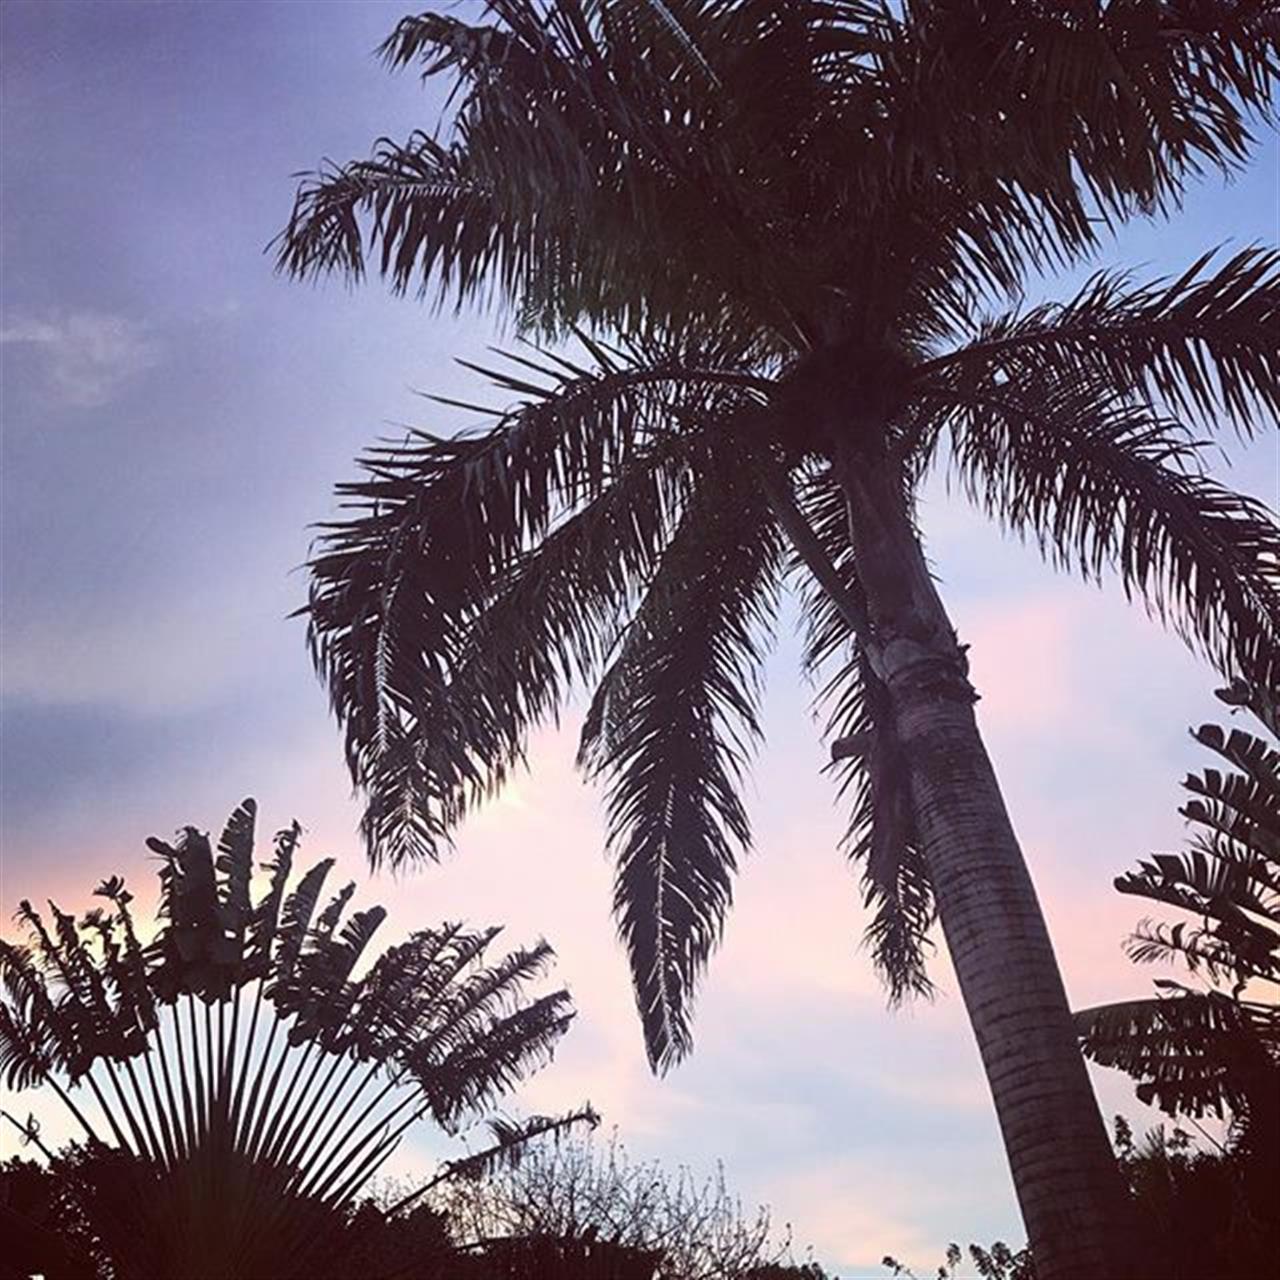 Wishing you all a happy Friday evening! #fridaymood #palms #naturephotography #naturelovers #tropicalnight #caribbean #leadingrelocal